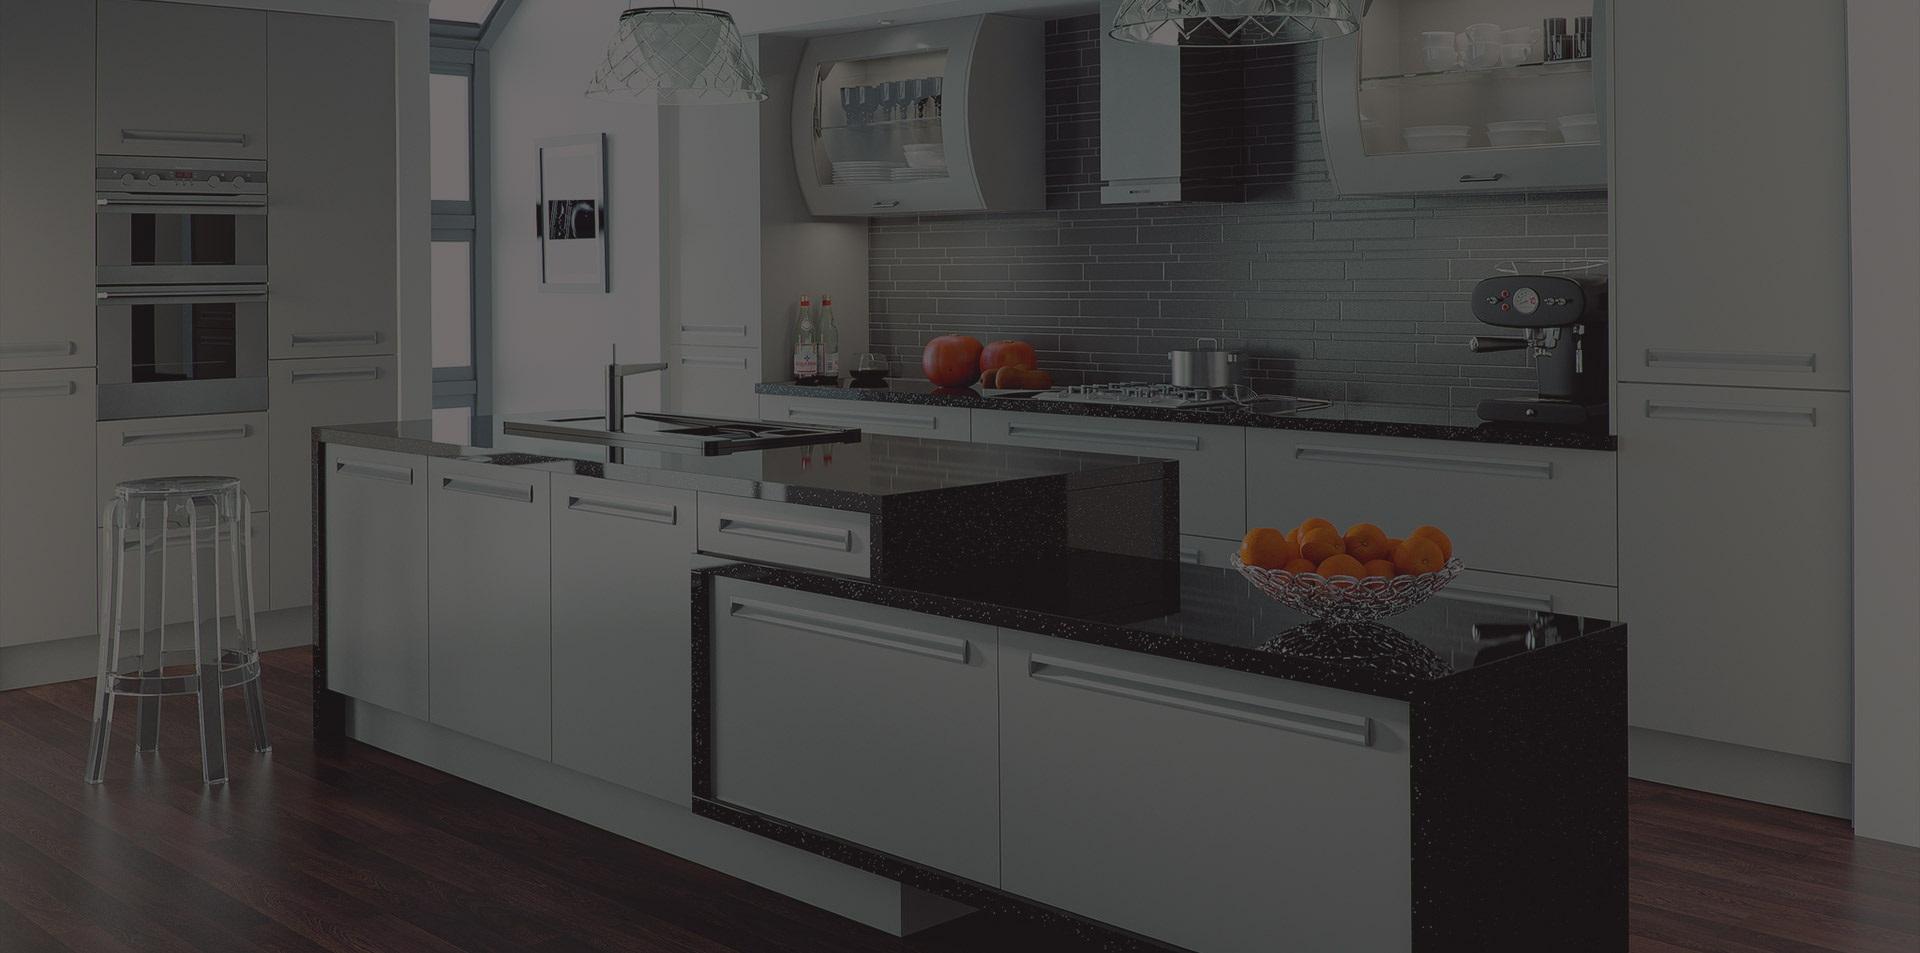 Granite kitchens zimbabwe interior designer fitted kitchens built in cupboards shop fitting for Fitted kitchen designs in zimbabwe